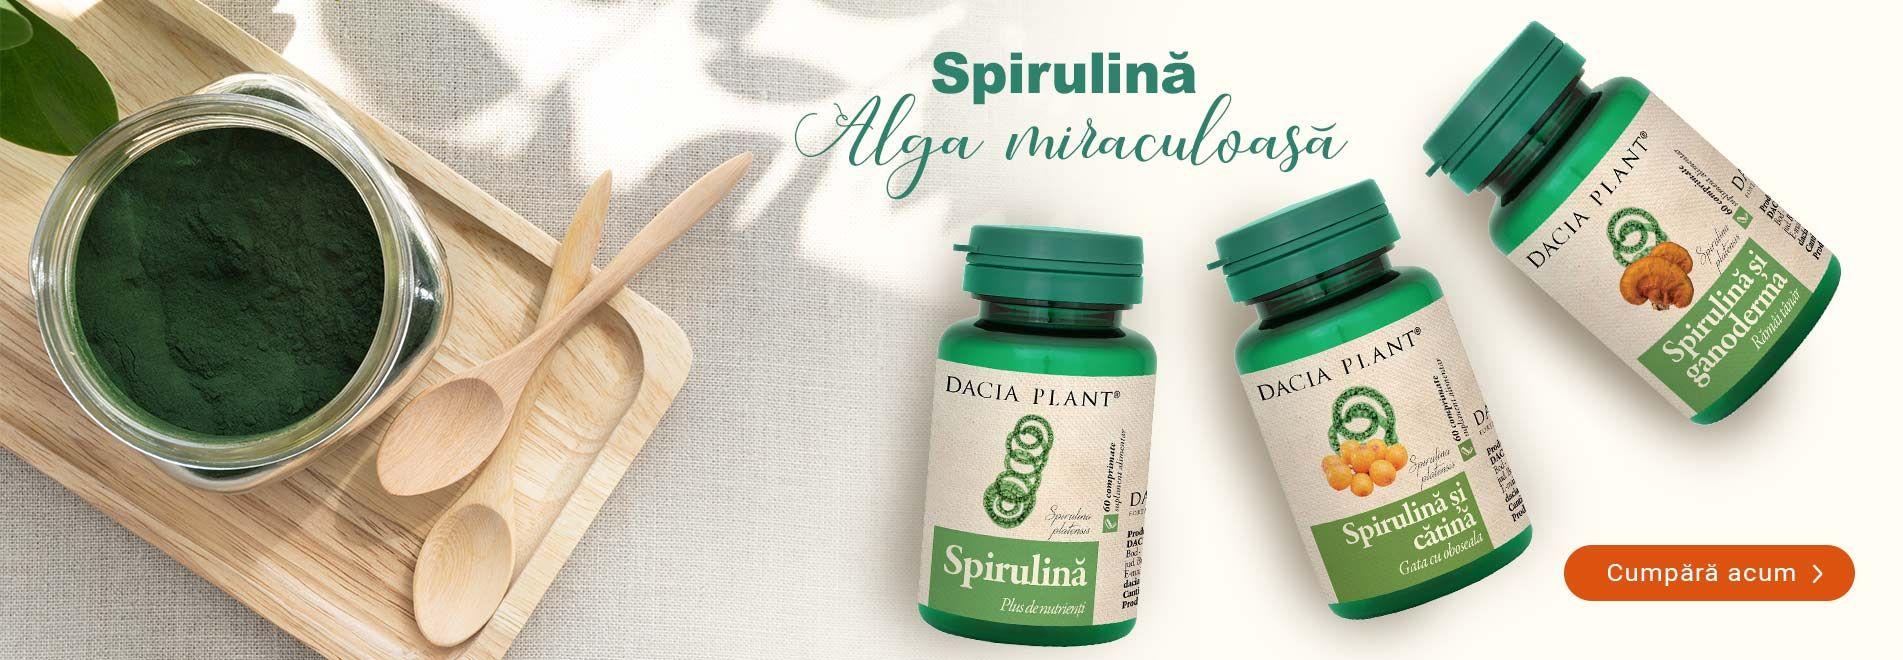 https://www.daciaplant.ro/catalogsearch/result/?q=spirulina